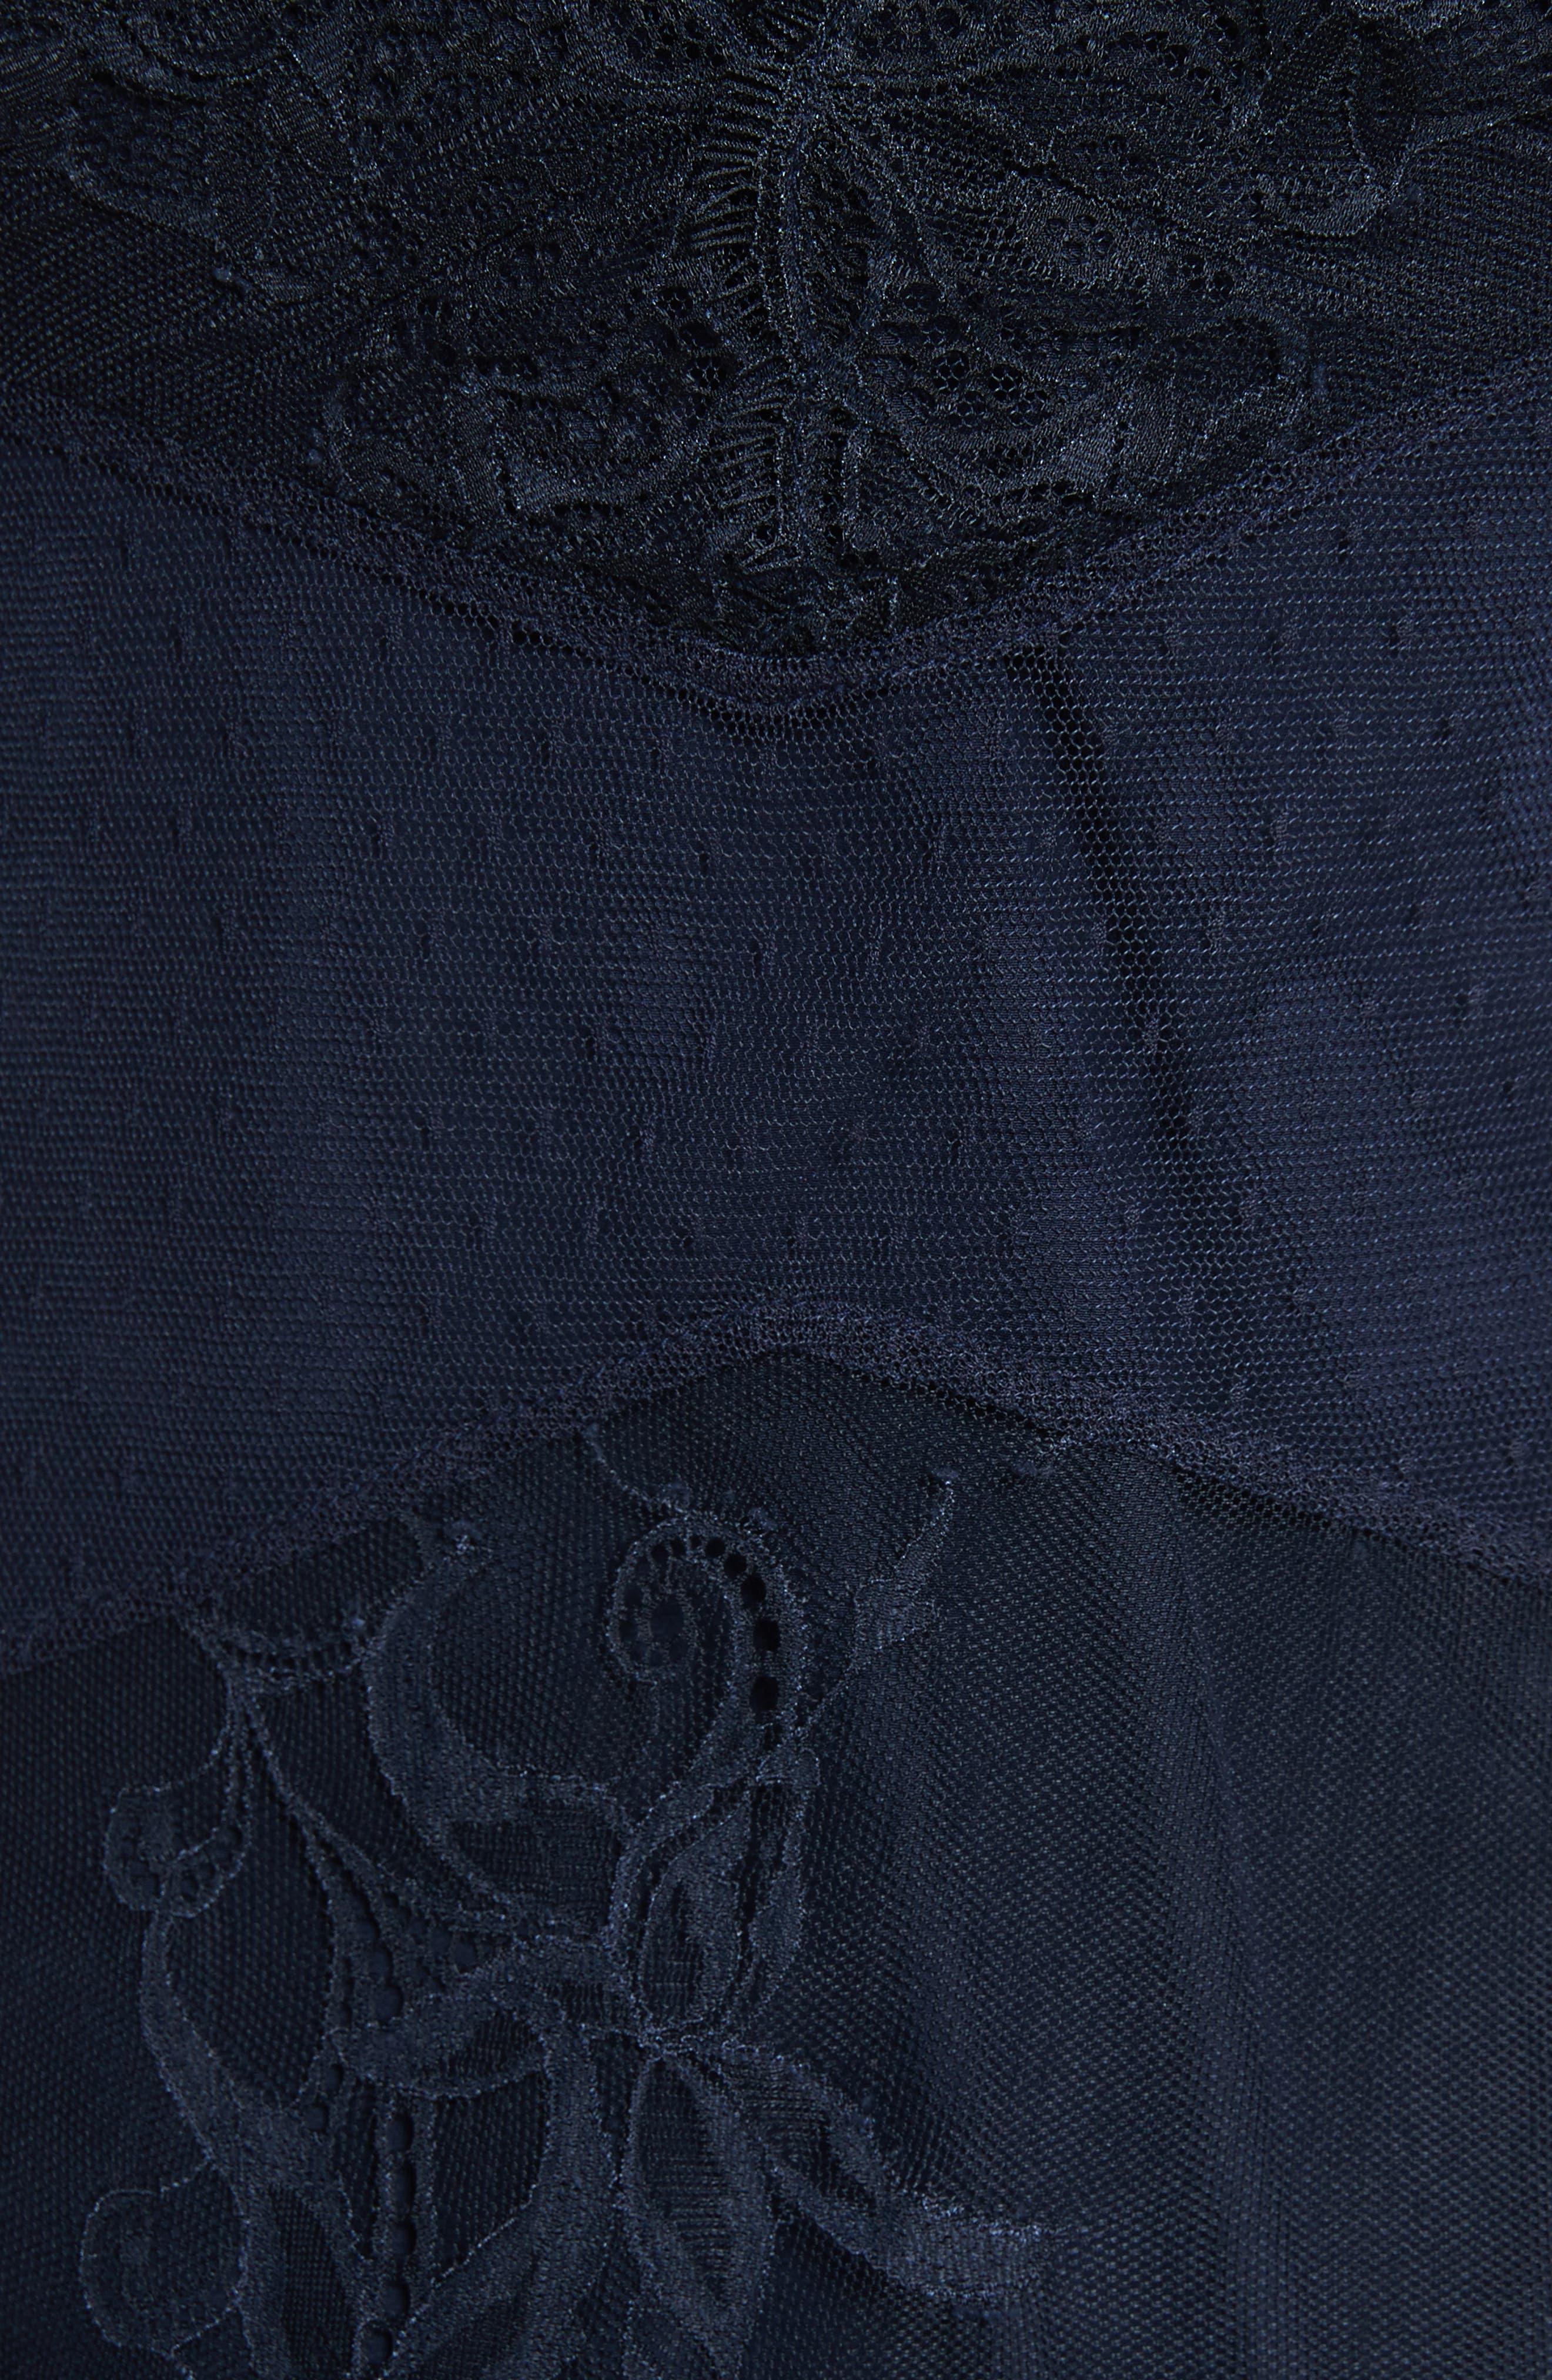 Amabella Feather Trim Dress,                             Alternate thumbnail 5, color,                             Navy